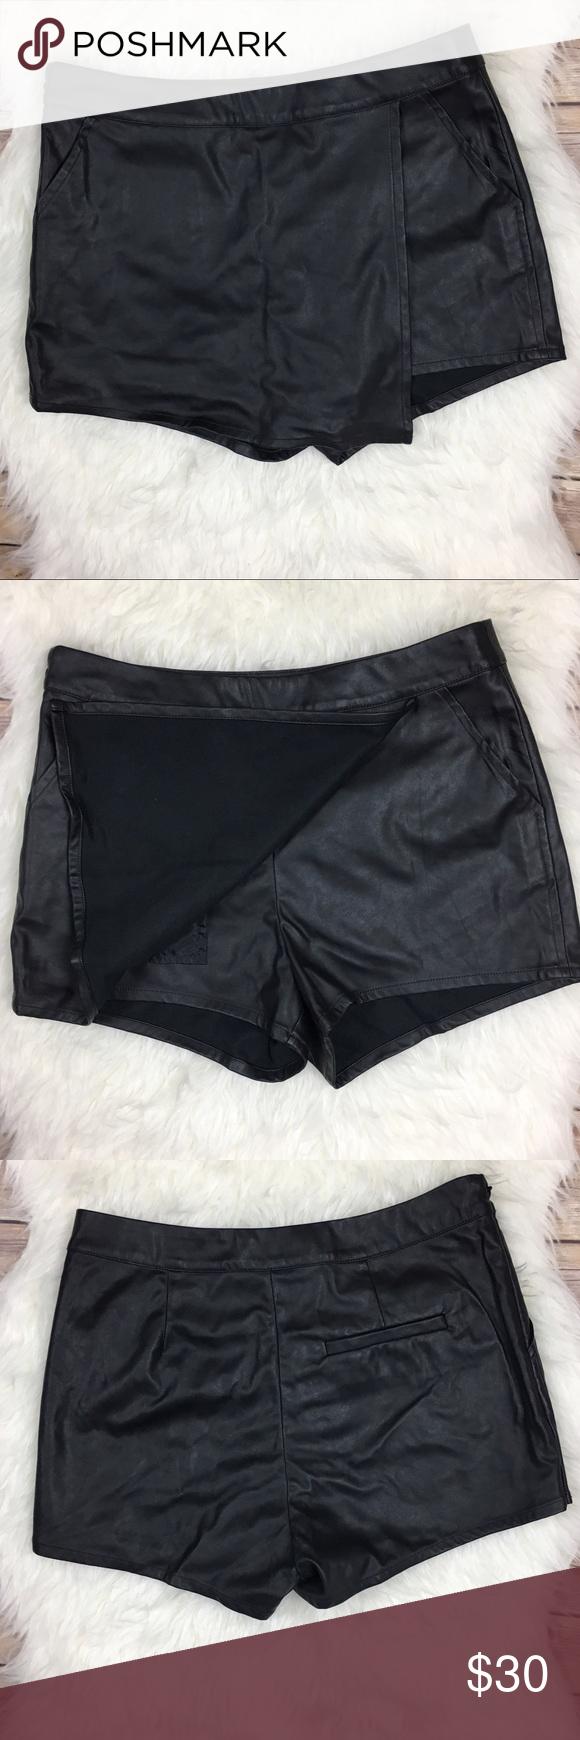 "H&M Black Faux Leather Skort H&M Black Faux Leather Skort. Size 8 100% Polyester measurements laying flat waist 15"" length 12"" rise 9.5"" inseam 2"". H&M Shorts Skorts"